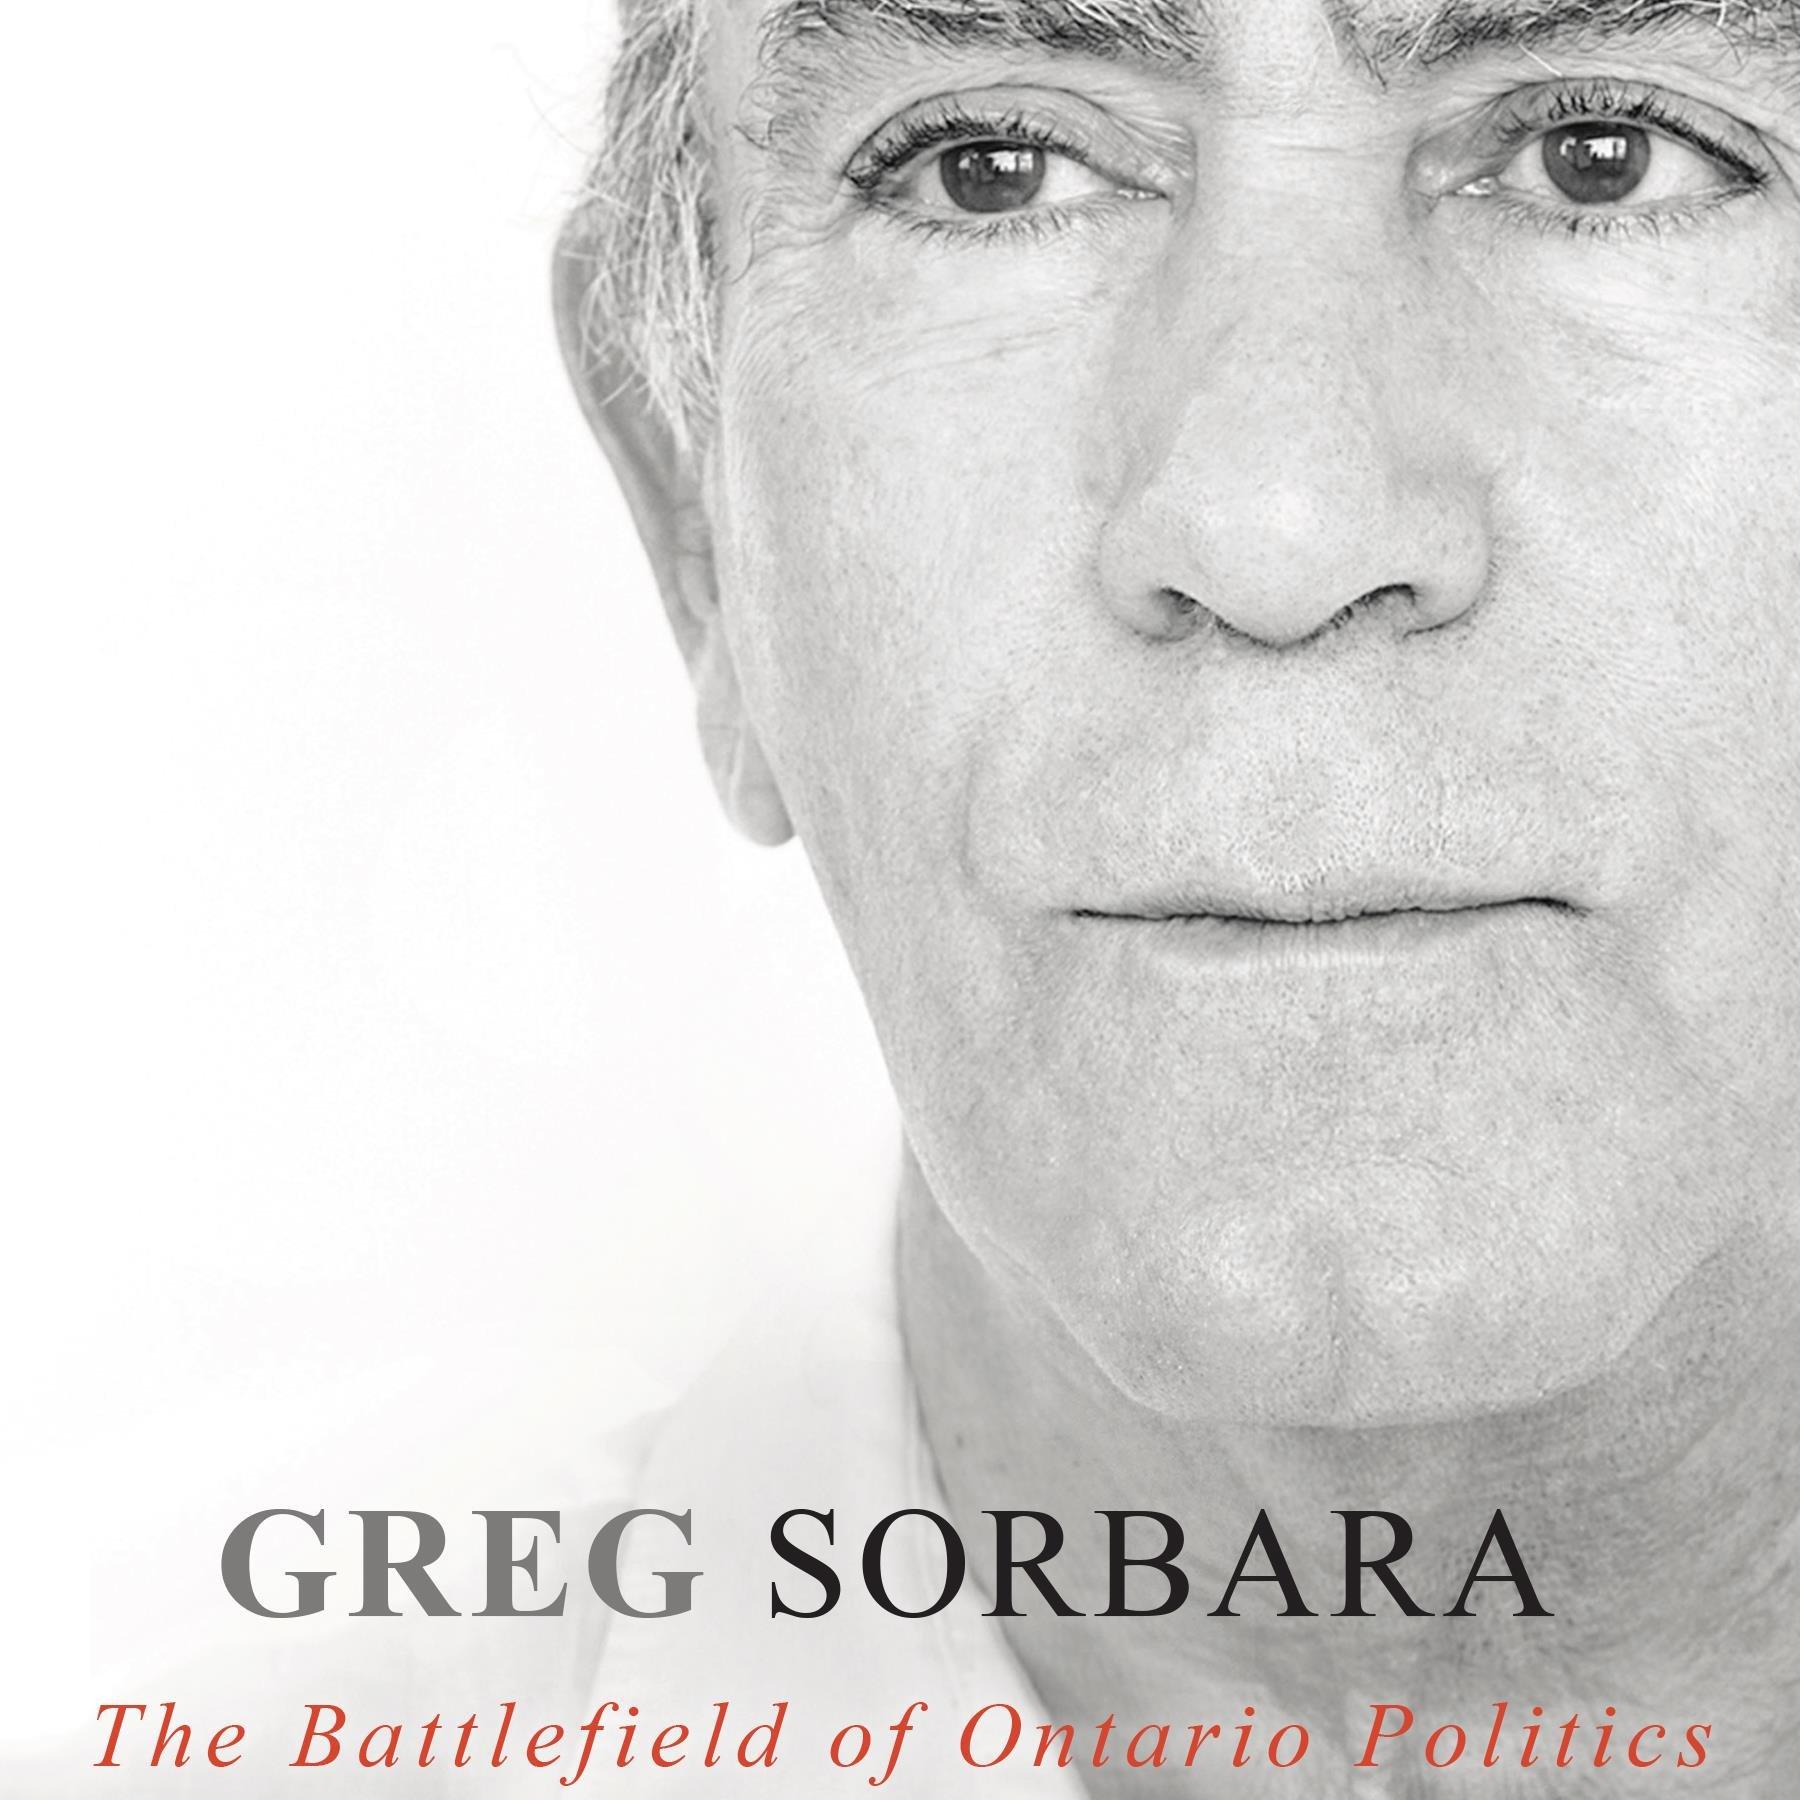 Greg Sorbara